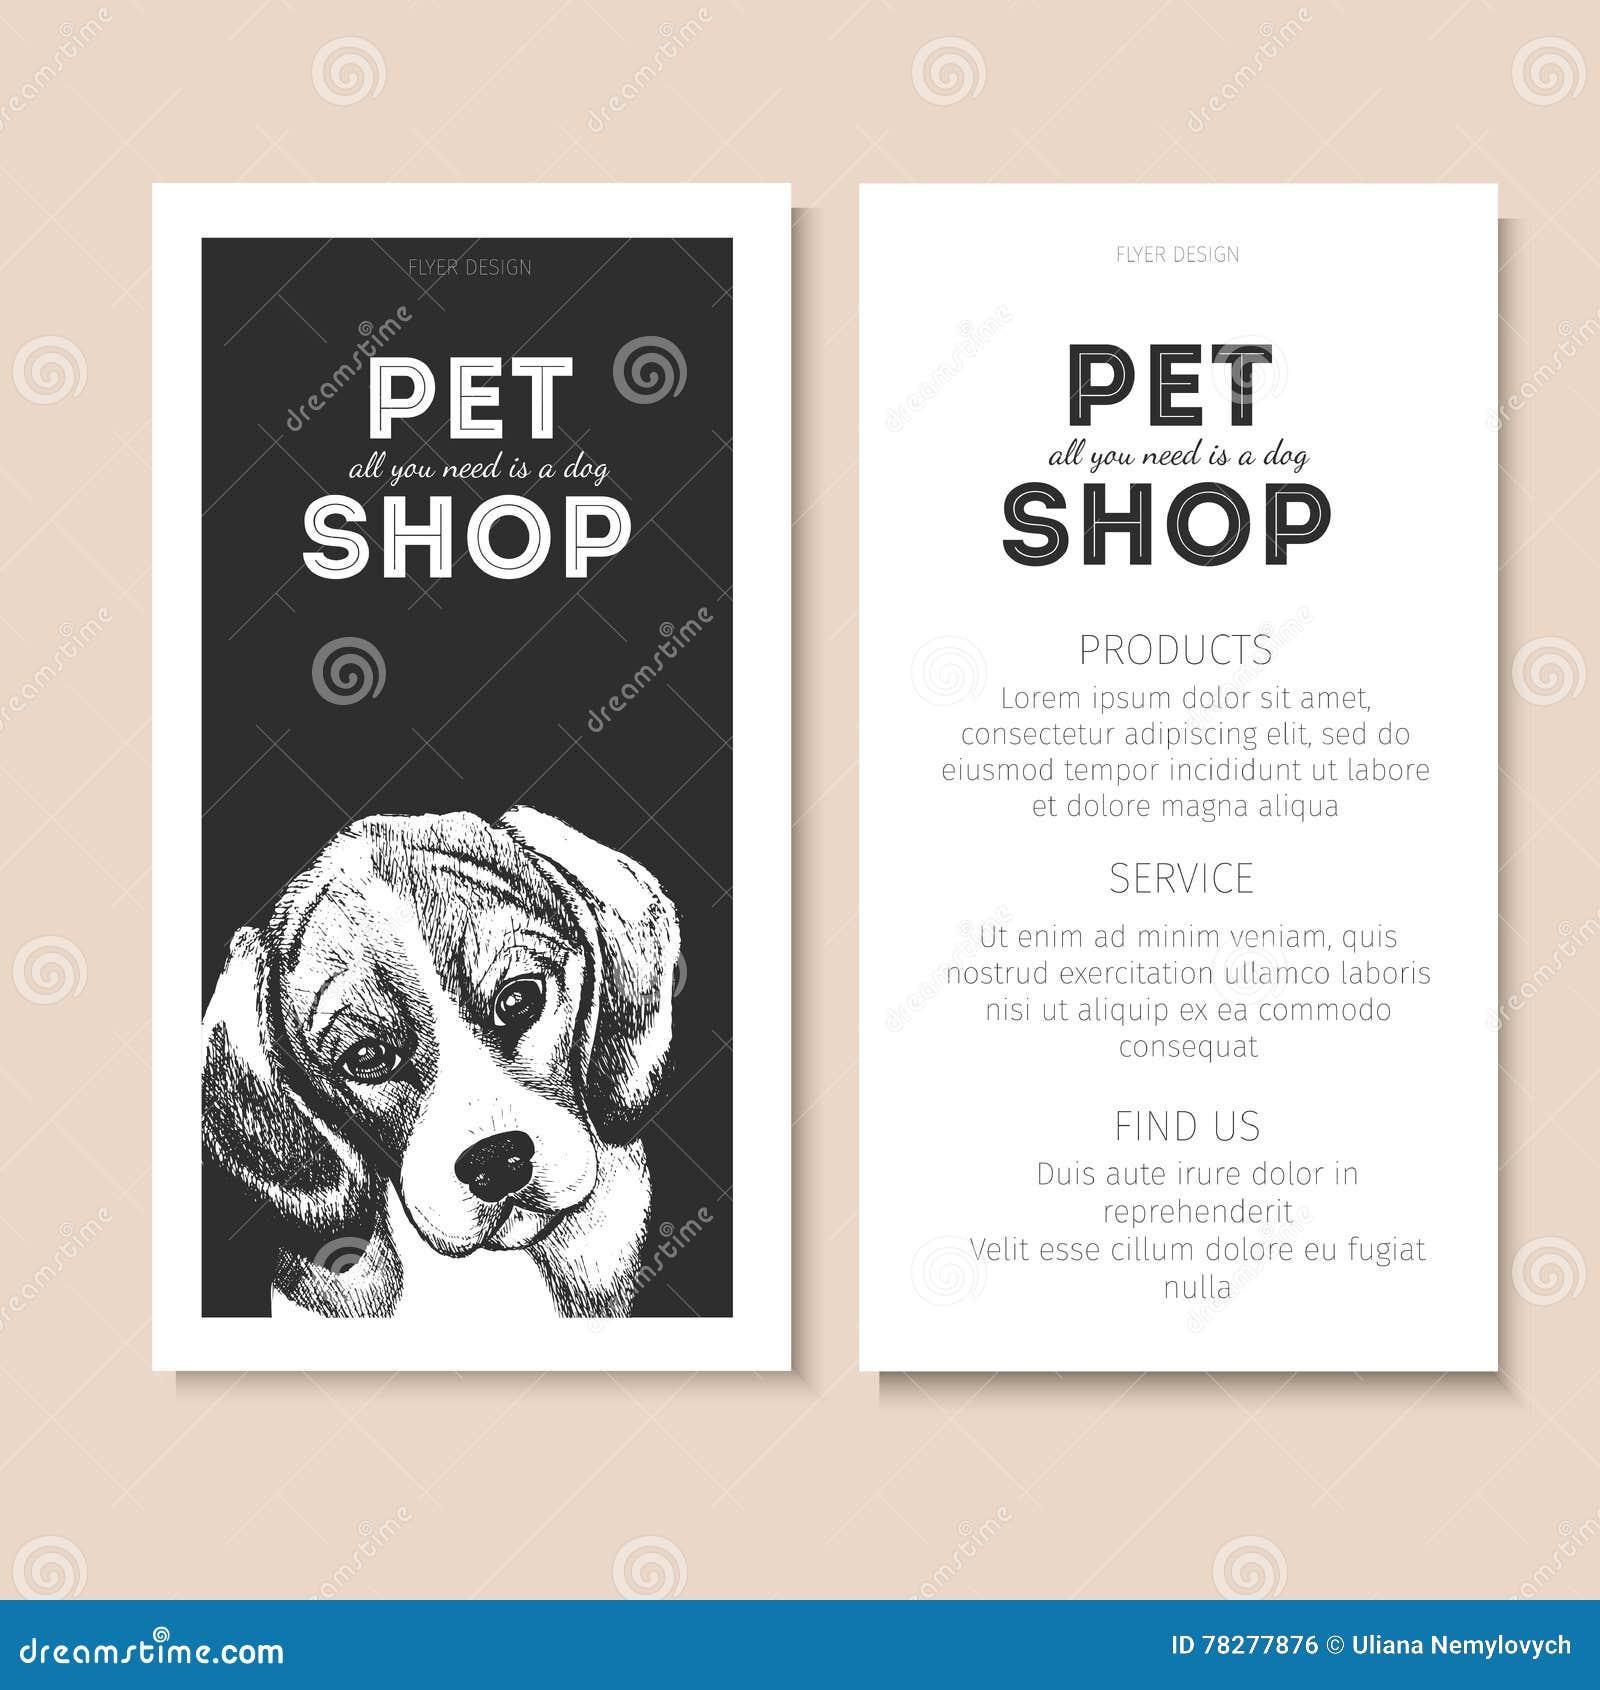 vector set of pet shop flyers dog portrait on black square text vector set of pet shop flyers dog portrait on black square text template white